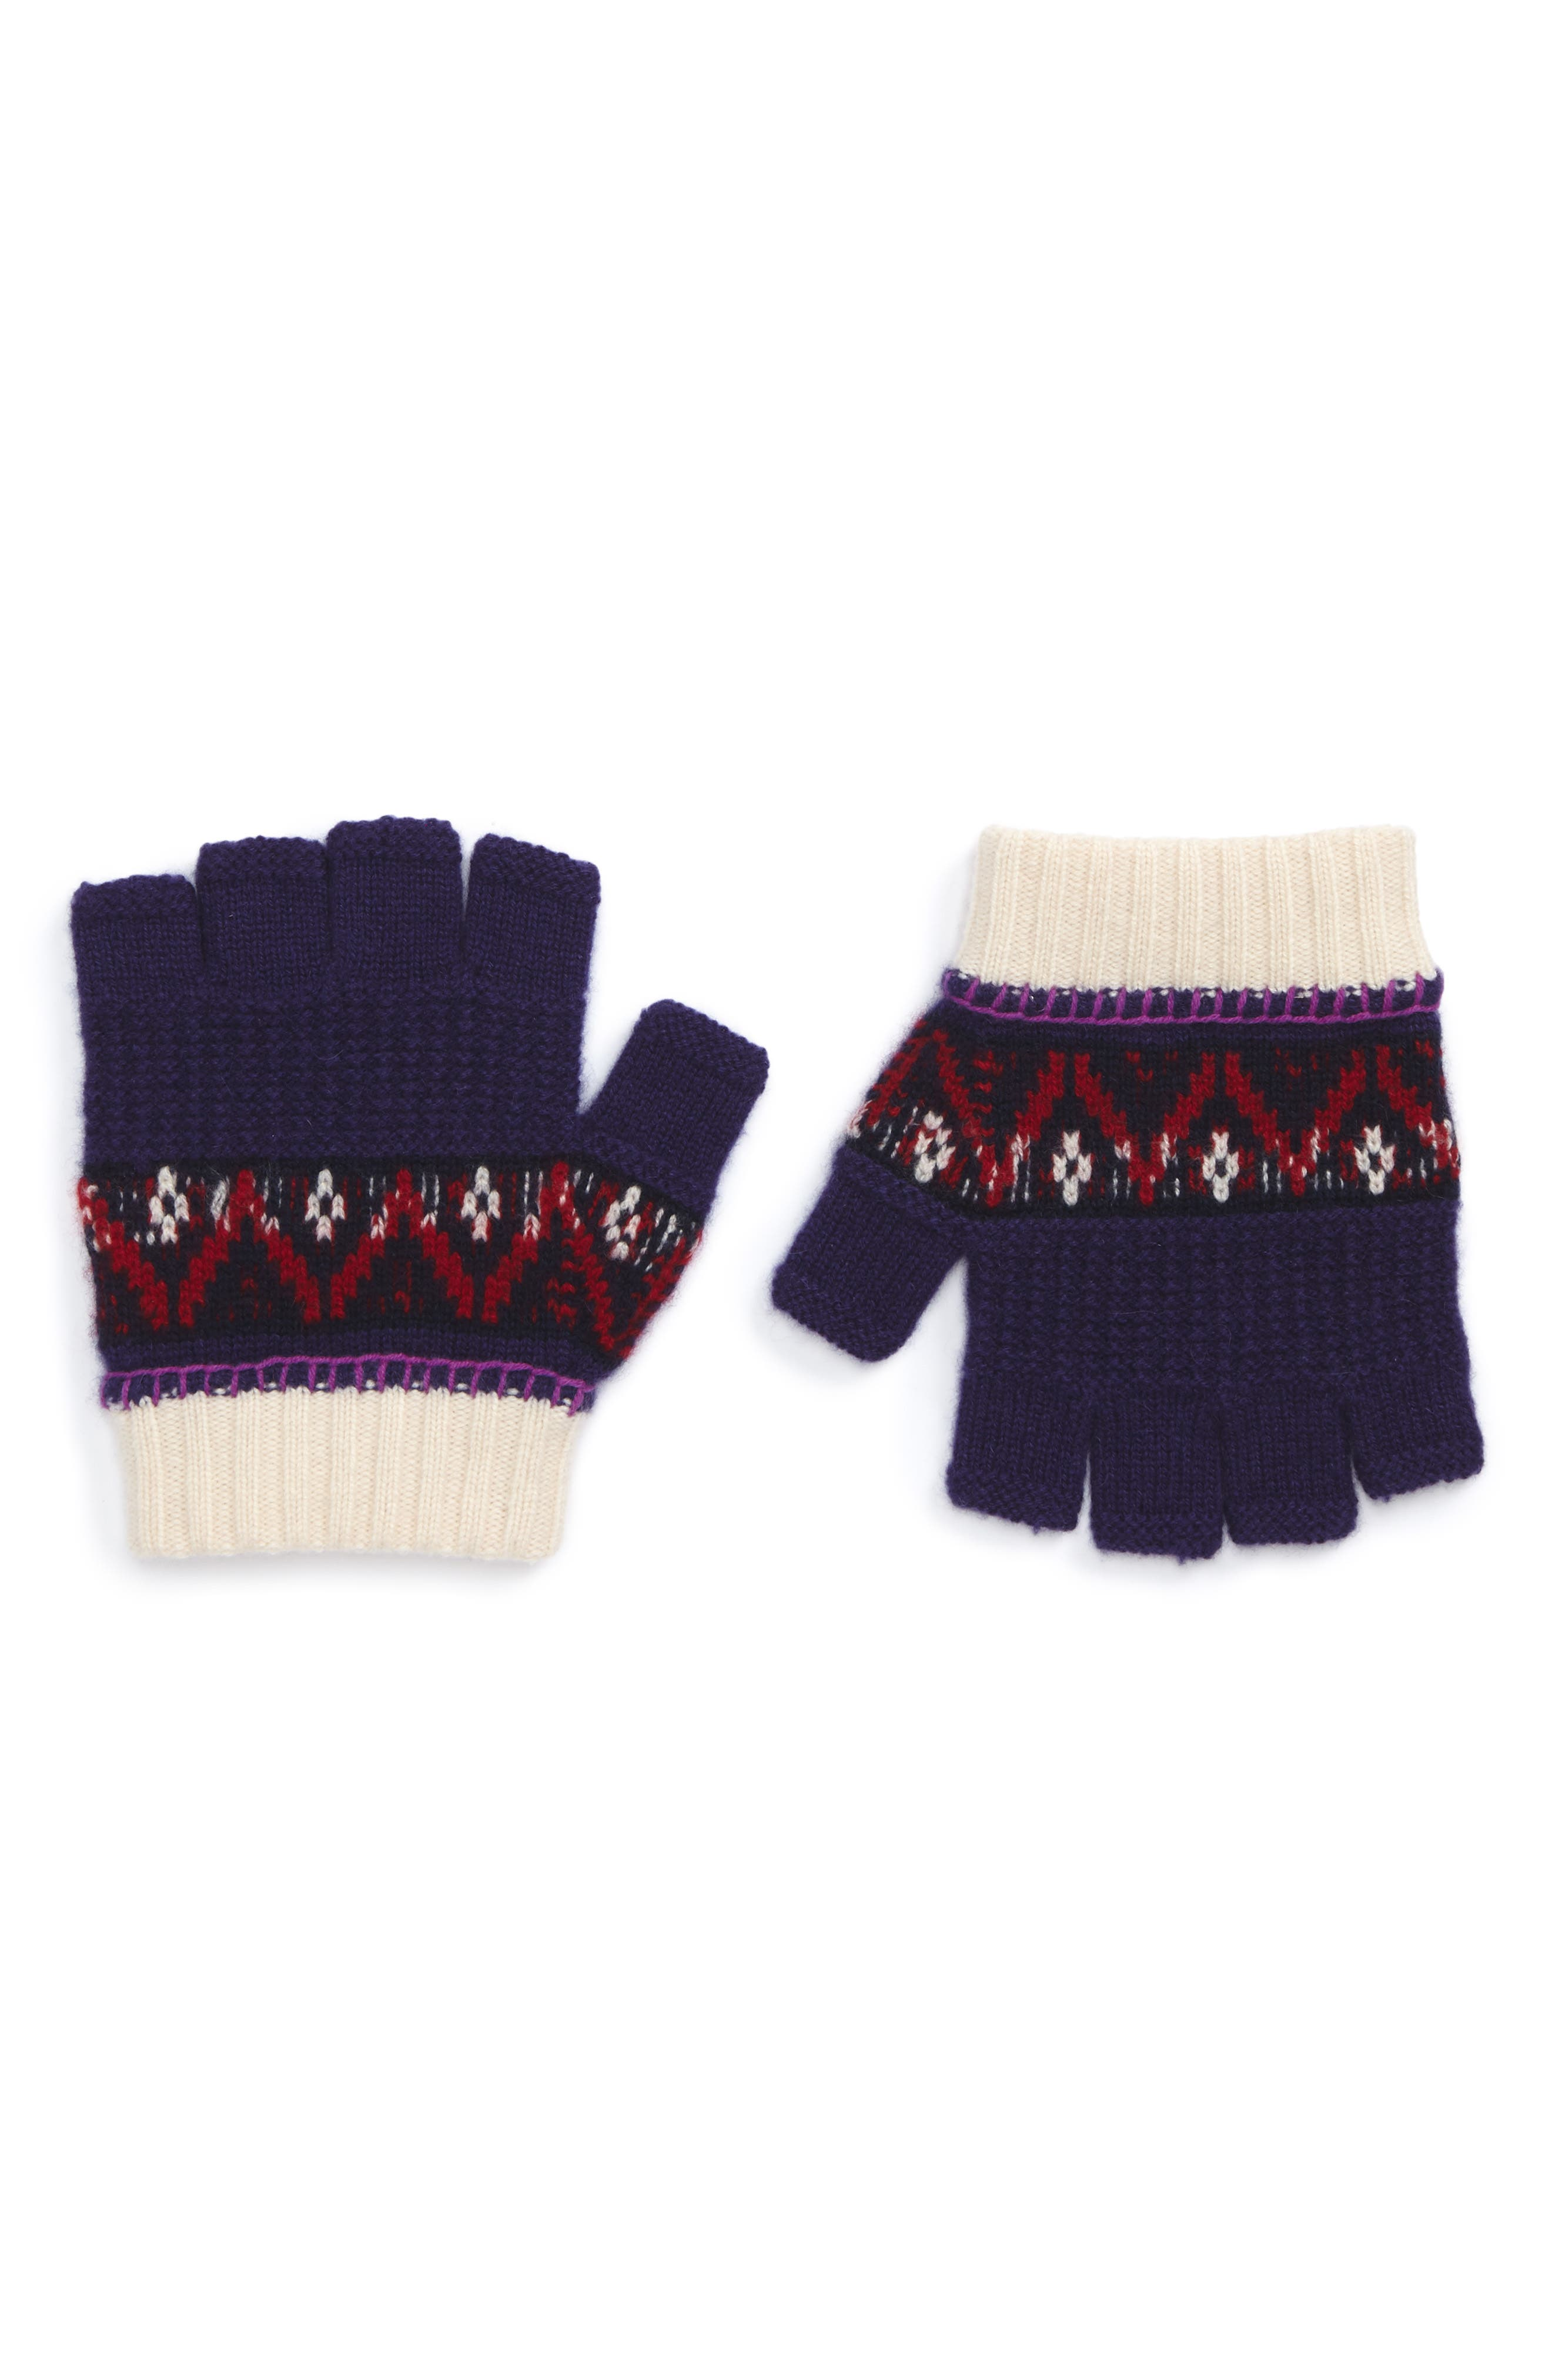 Fair Isle Fingerless Gloves,                             Main thumbnail 1, color,                             Purple Grape